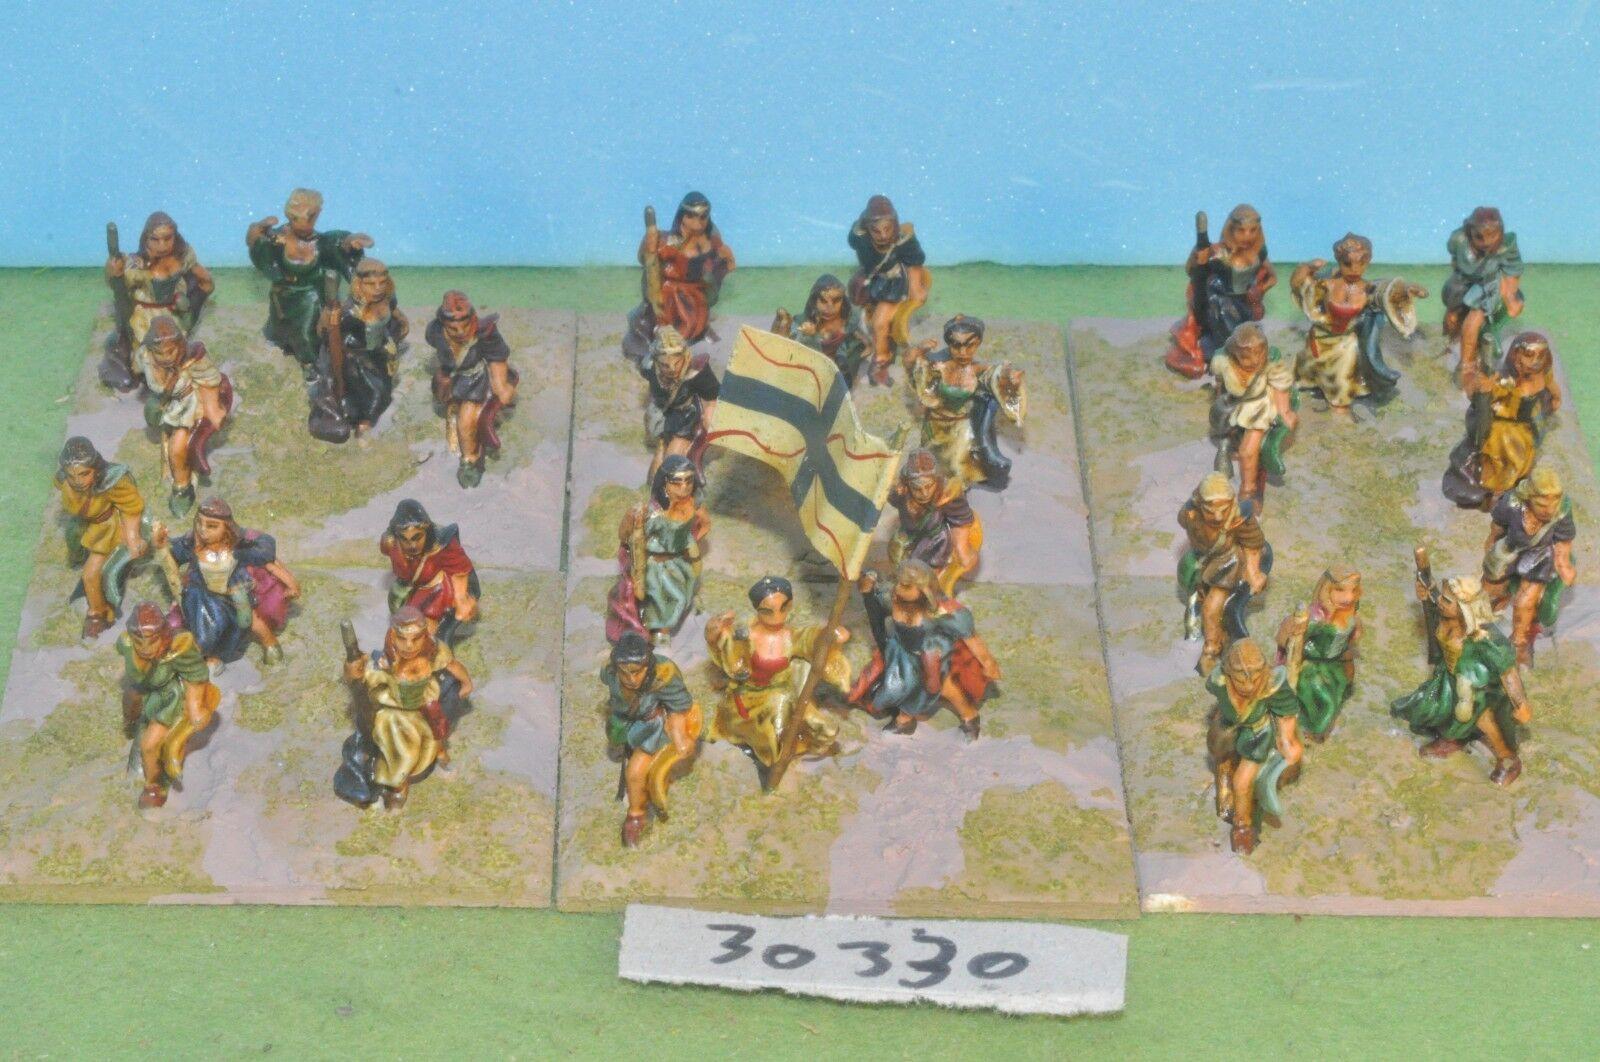 Fantasy femelle Chevaliers Valkyrie Amazonian Warriors 30 30 30 métal (30330) eaa503